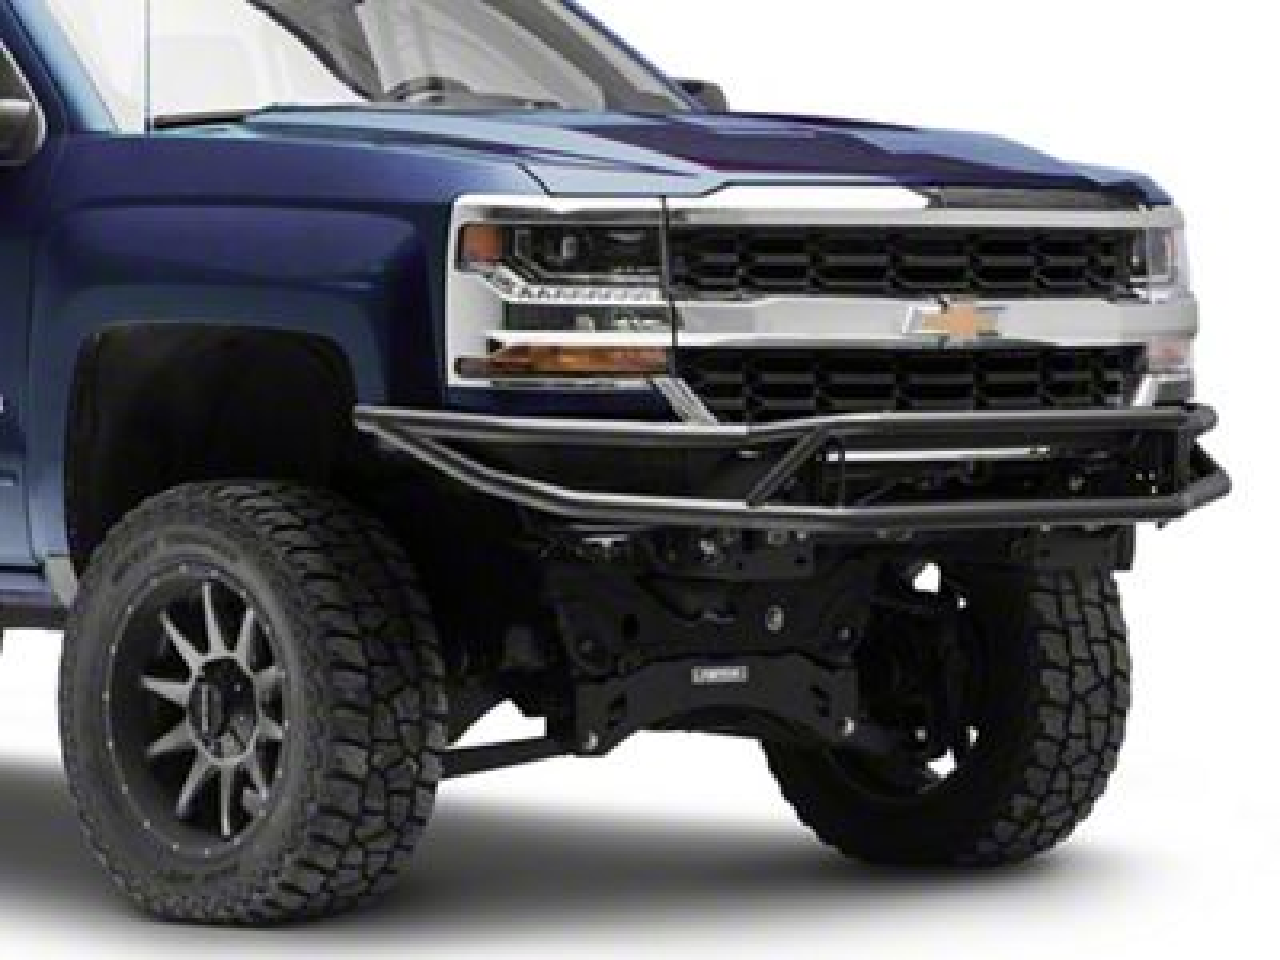 Westin Outlaw Front Bumper - Textured Black (16-18 Silverado 1500)